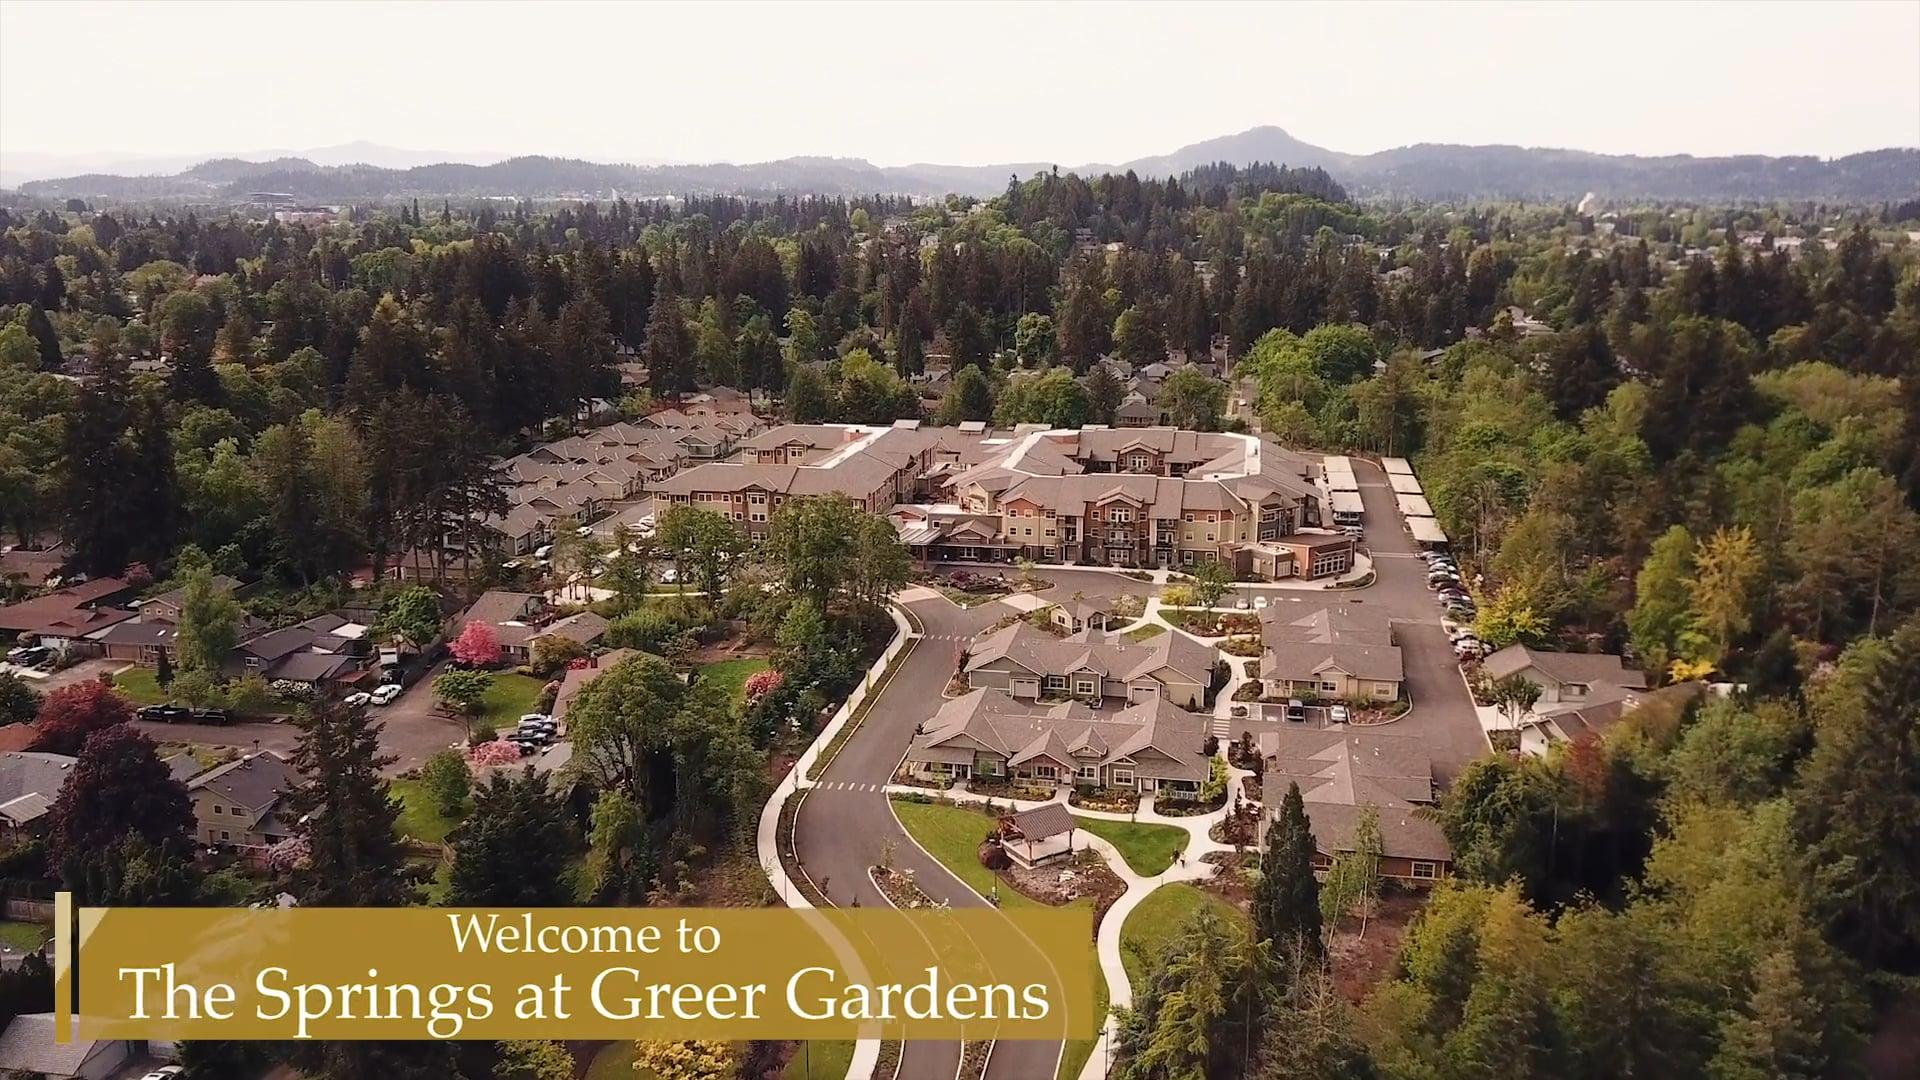 The Springs at Greer Gardens